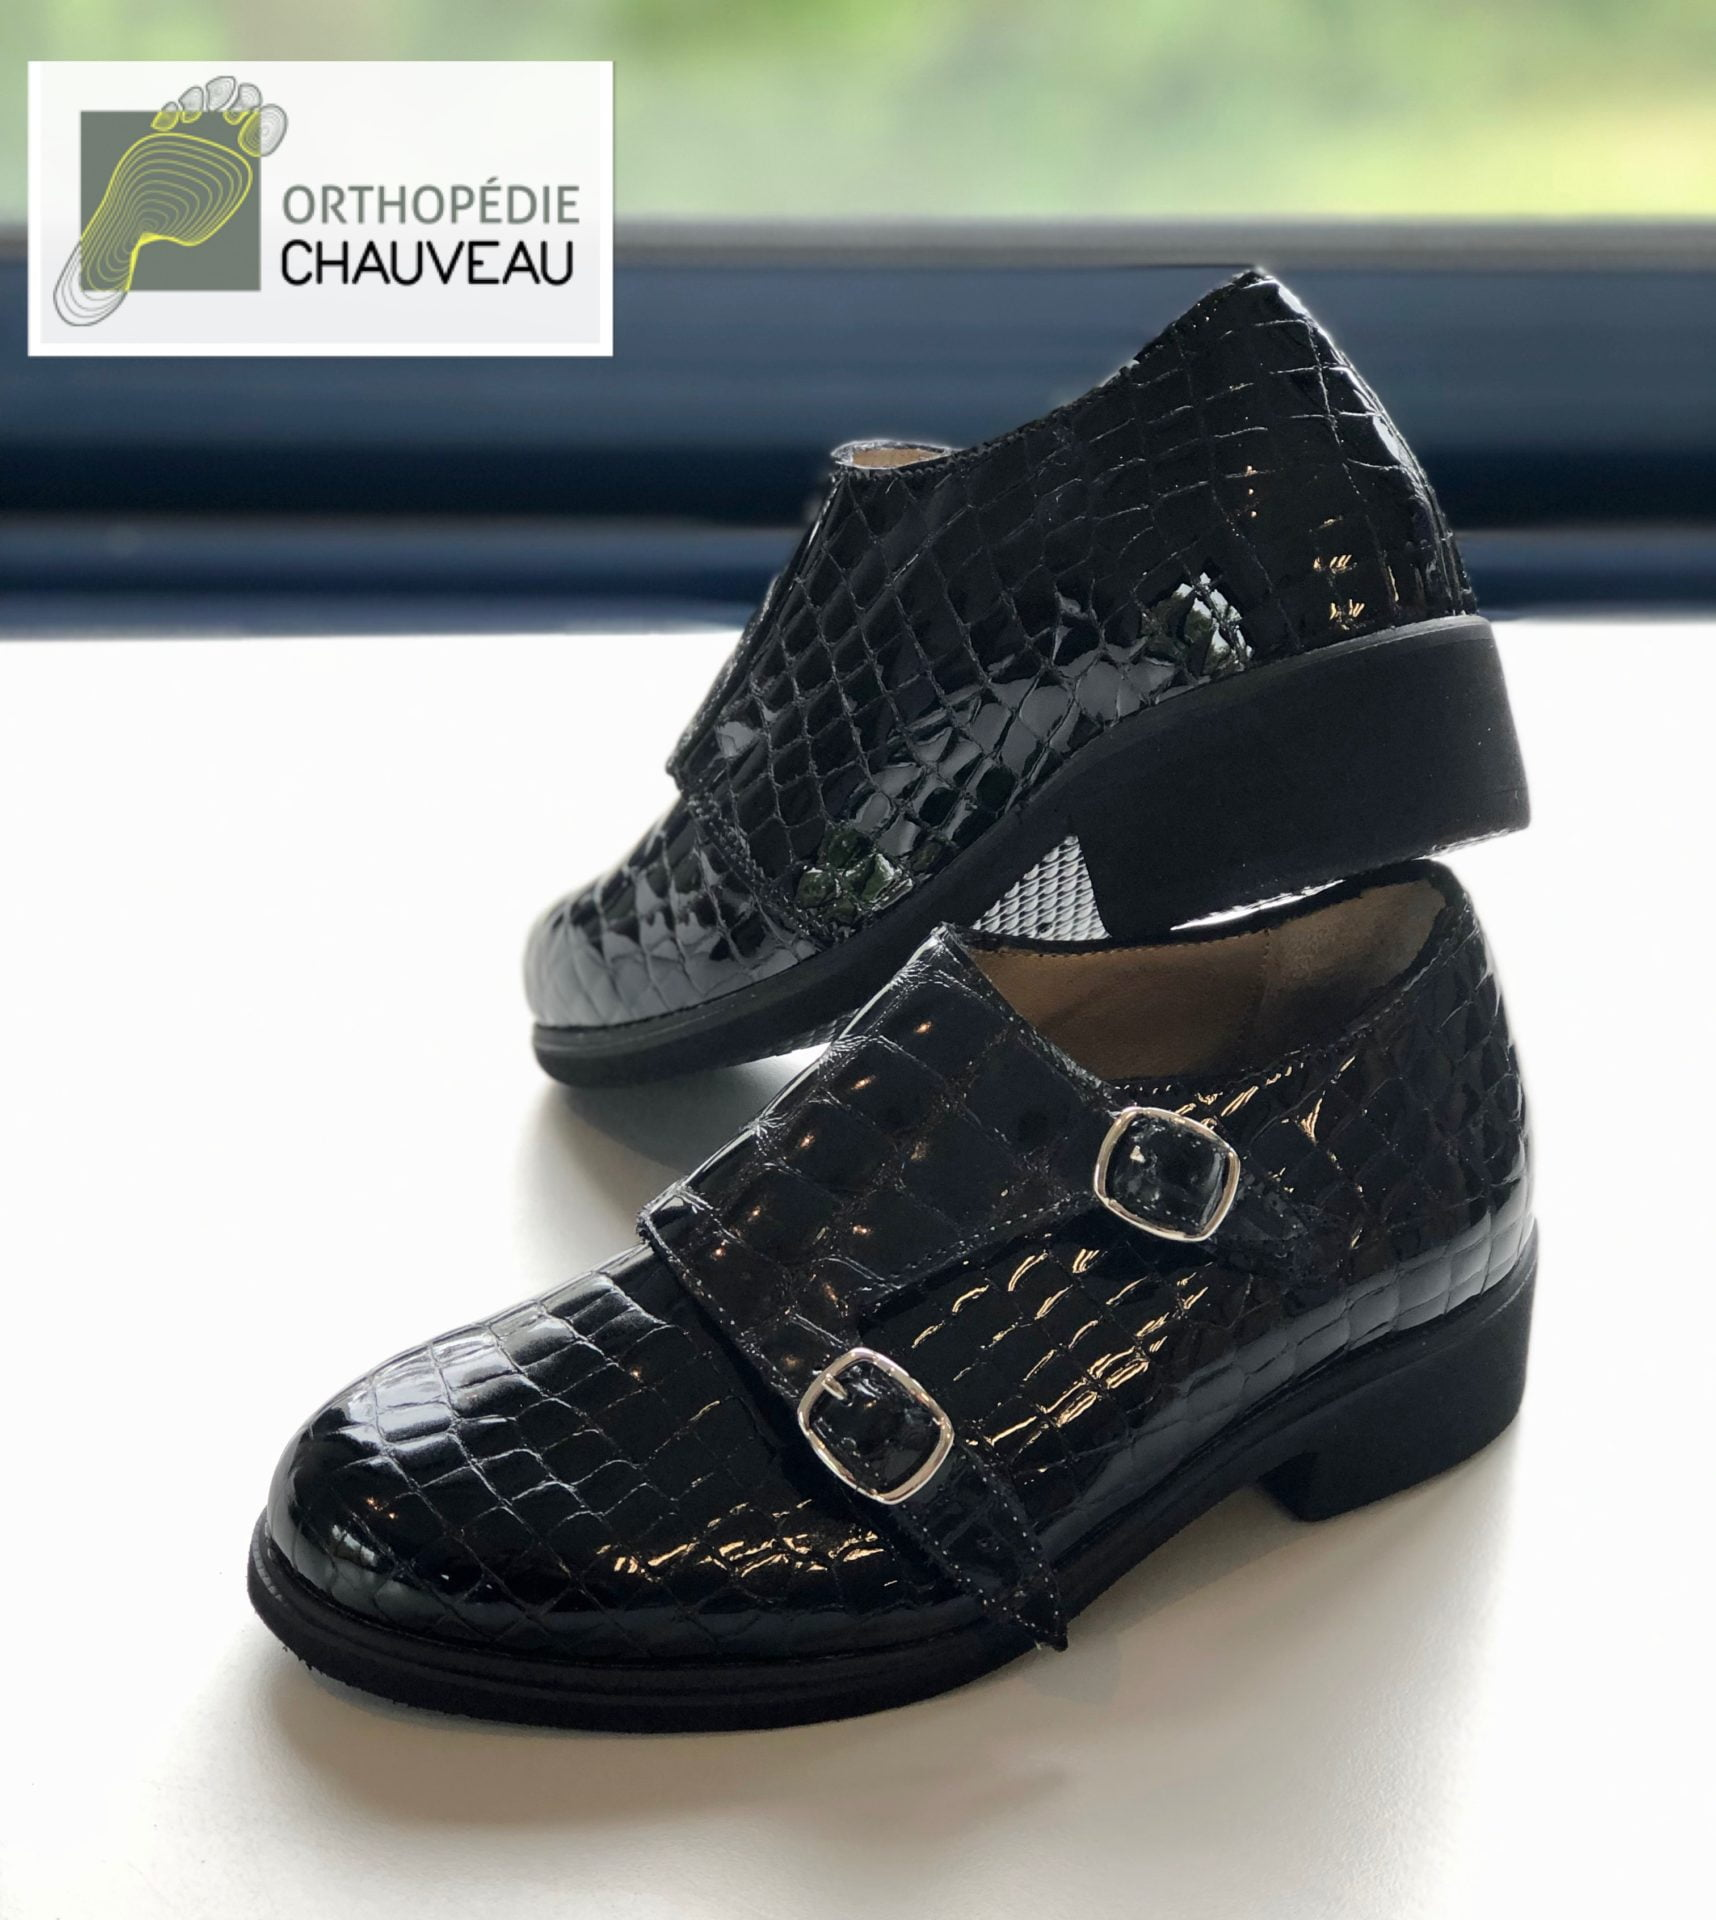 chaussures orthopediques Rennes richelieu